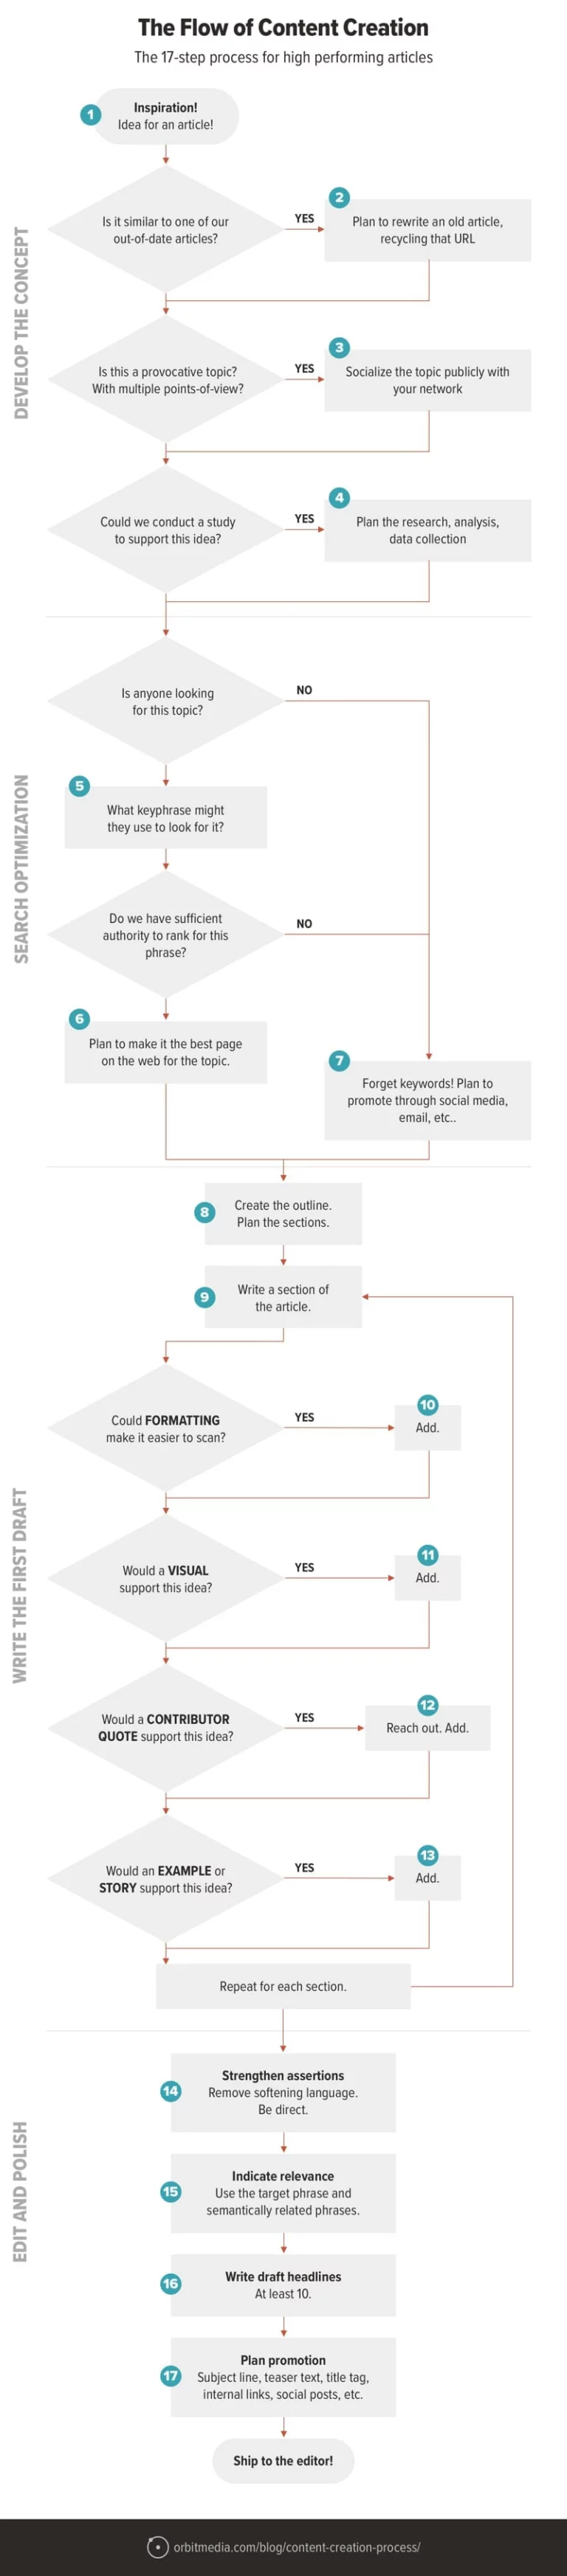 Content creation flow chart